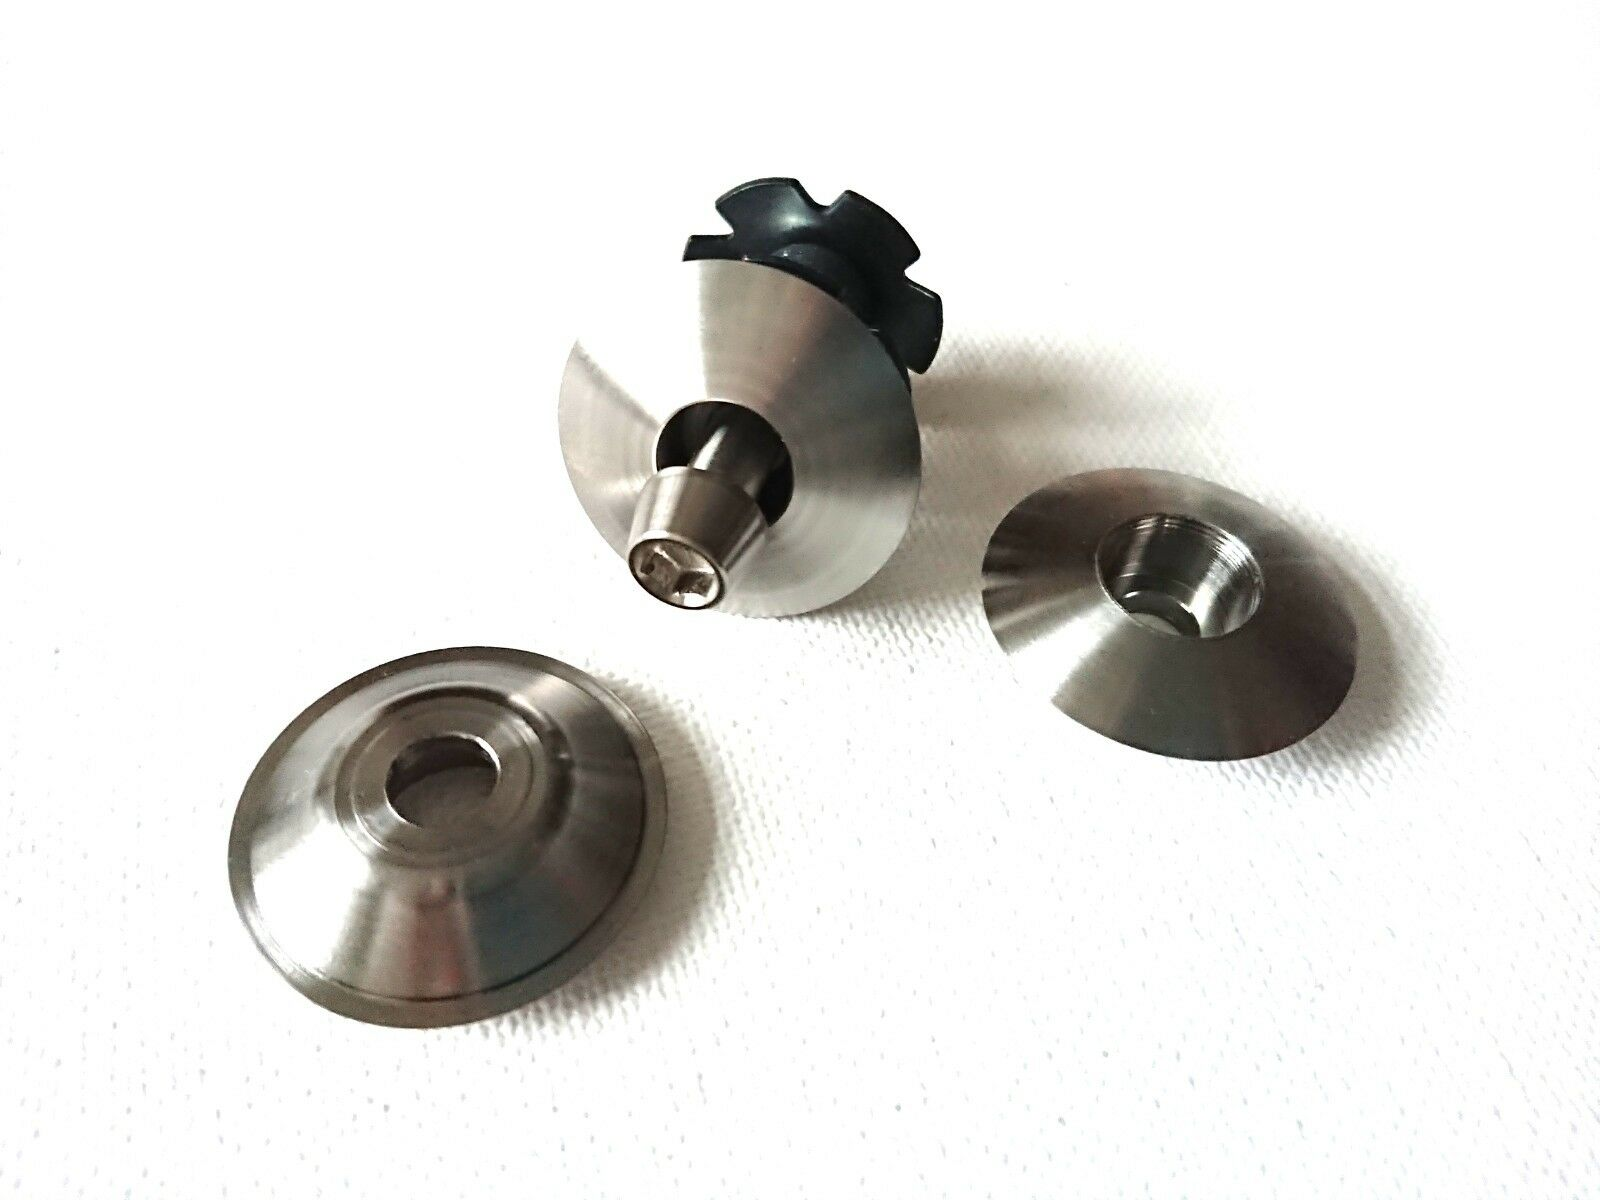 1Zoll 1  1inch A-head Kappe top cap Titan Steuersatz titanium headset king 1 zol